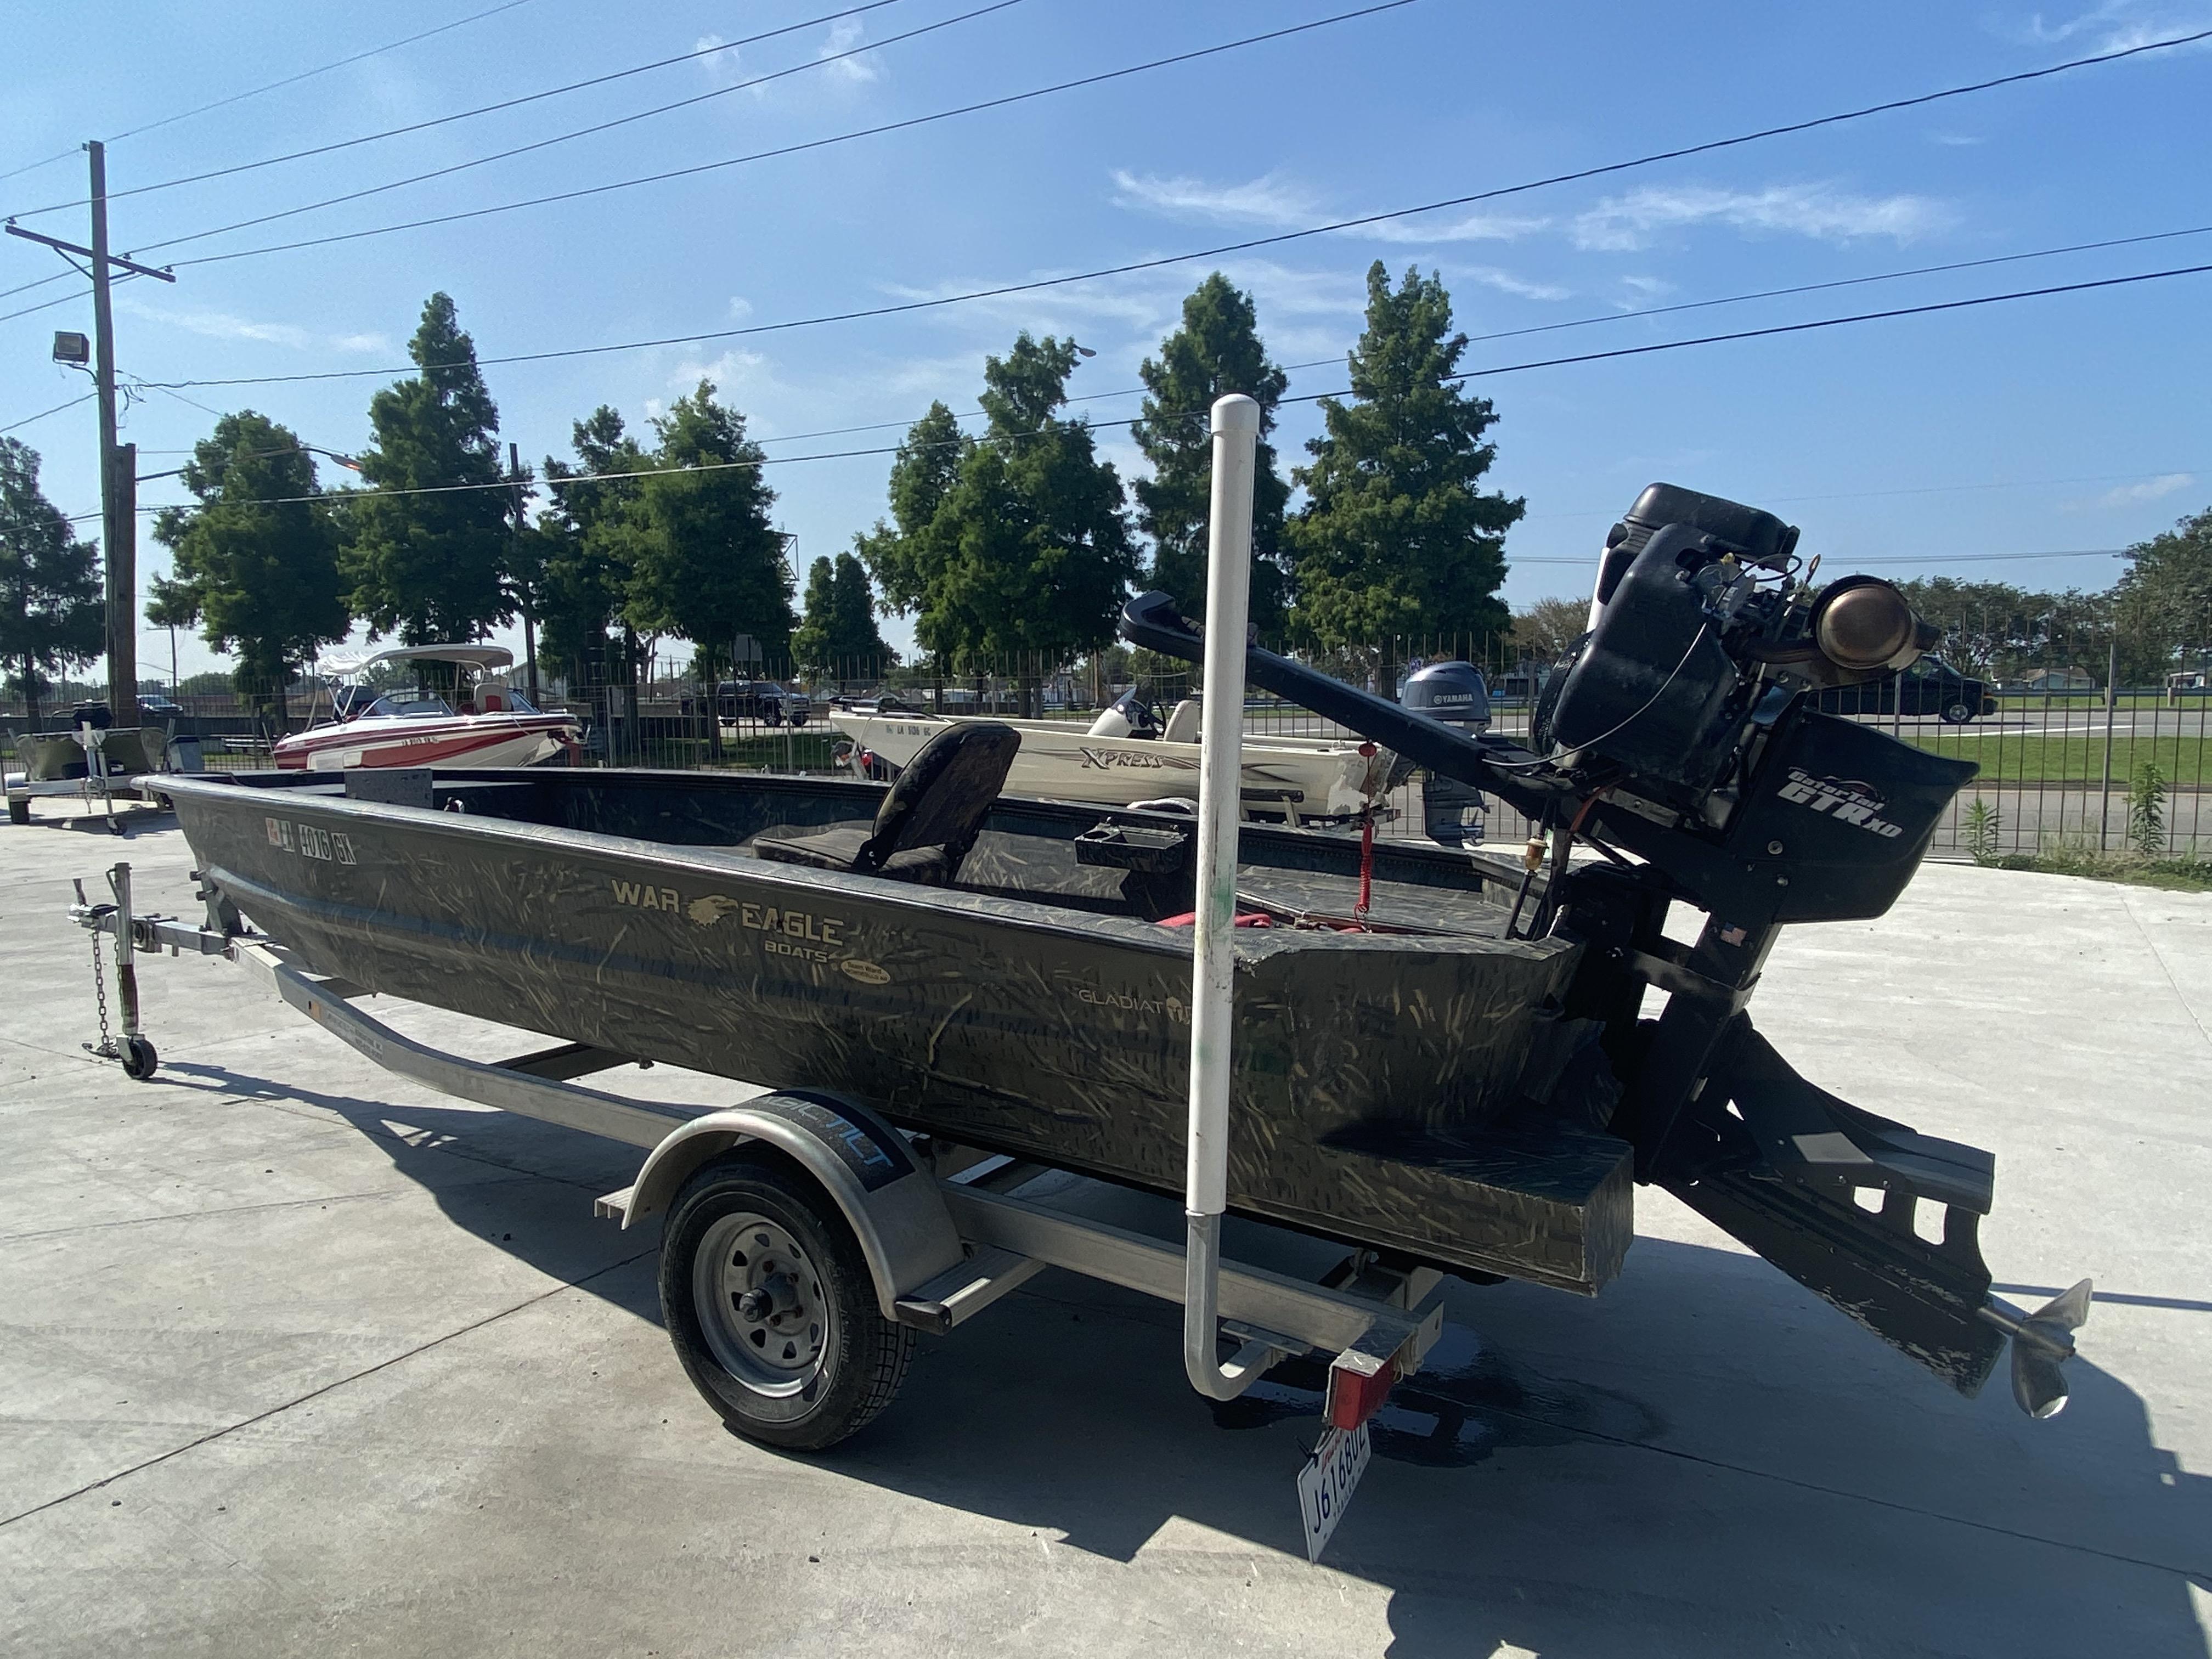 2020 War Eagle boat for sale, model of the boat is Gladiator 750 & Image # 3 of 11